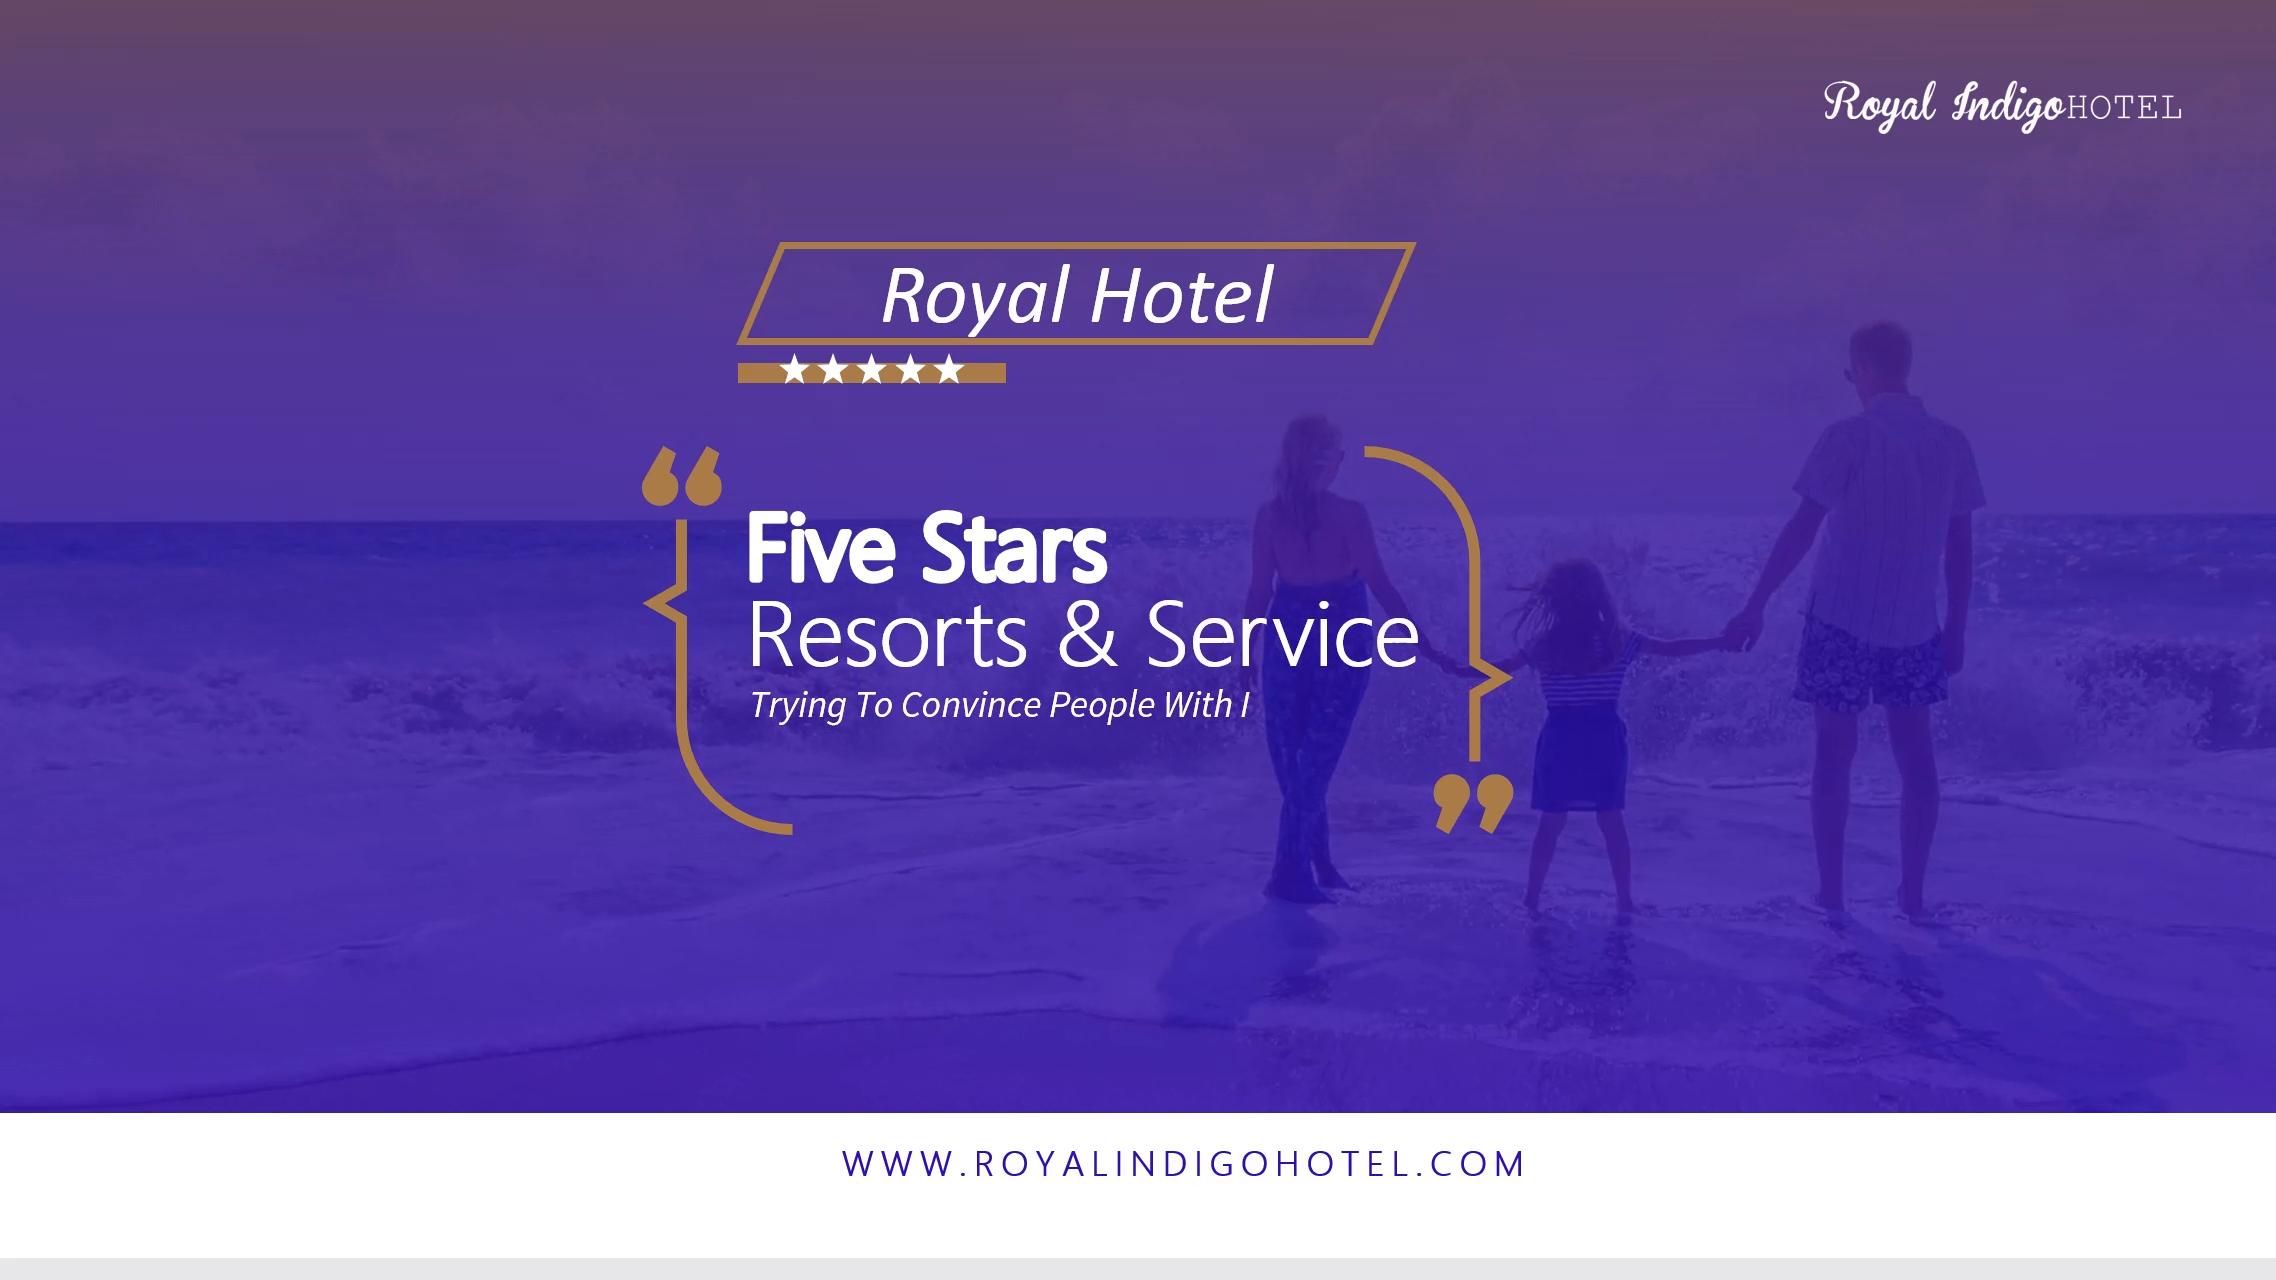 Digital Signage Template for Hotels